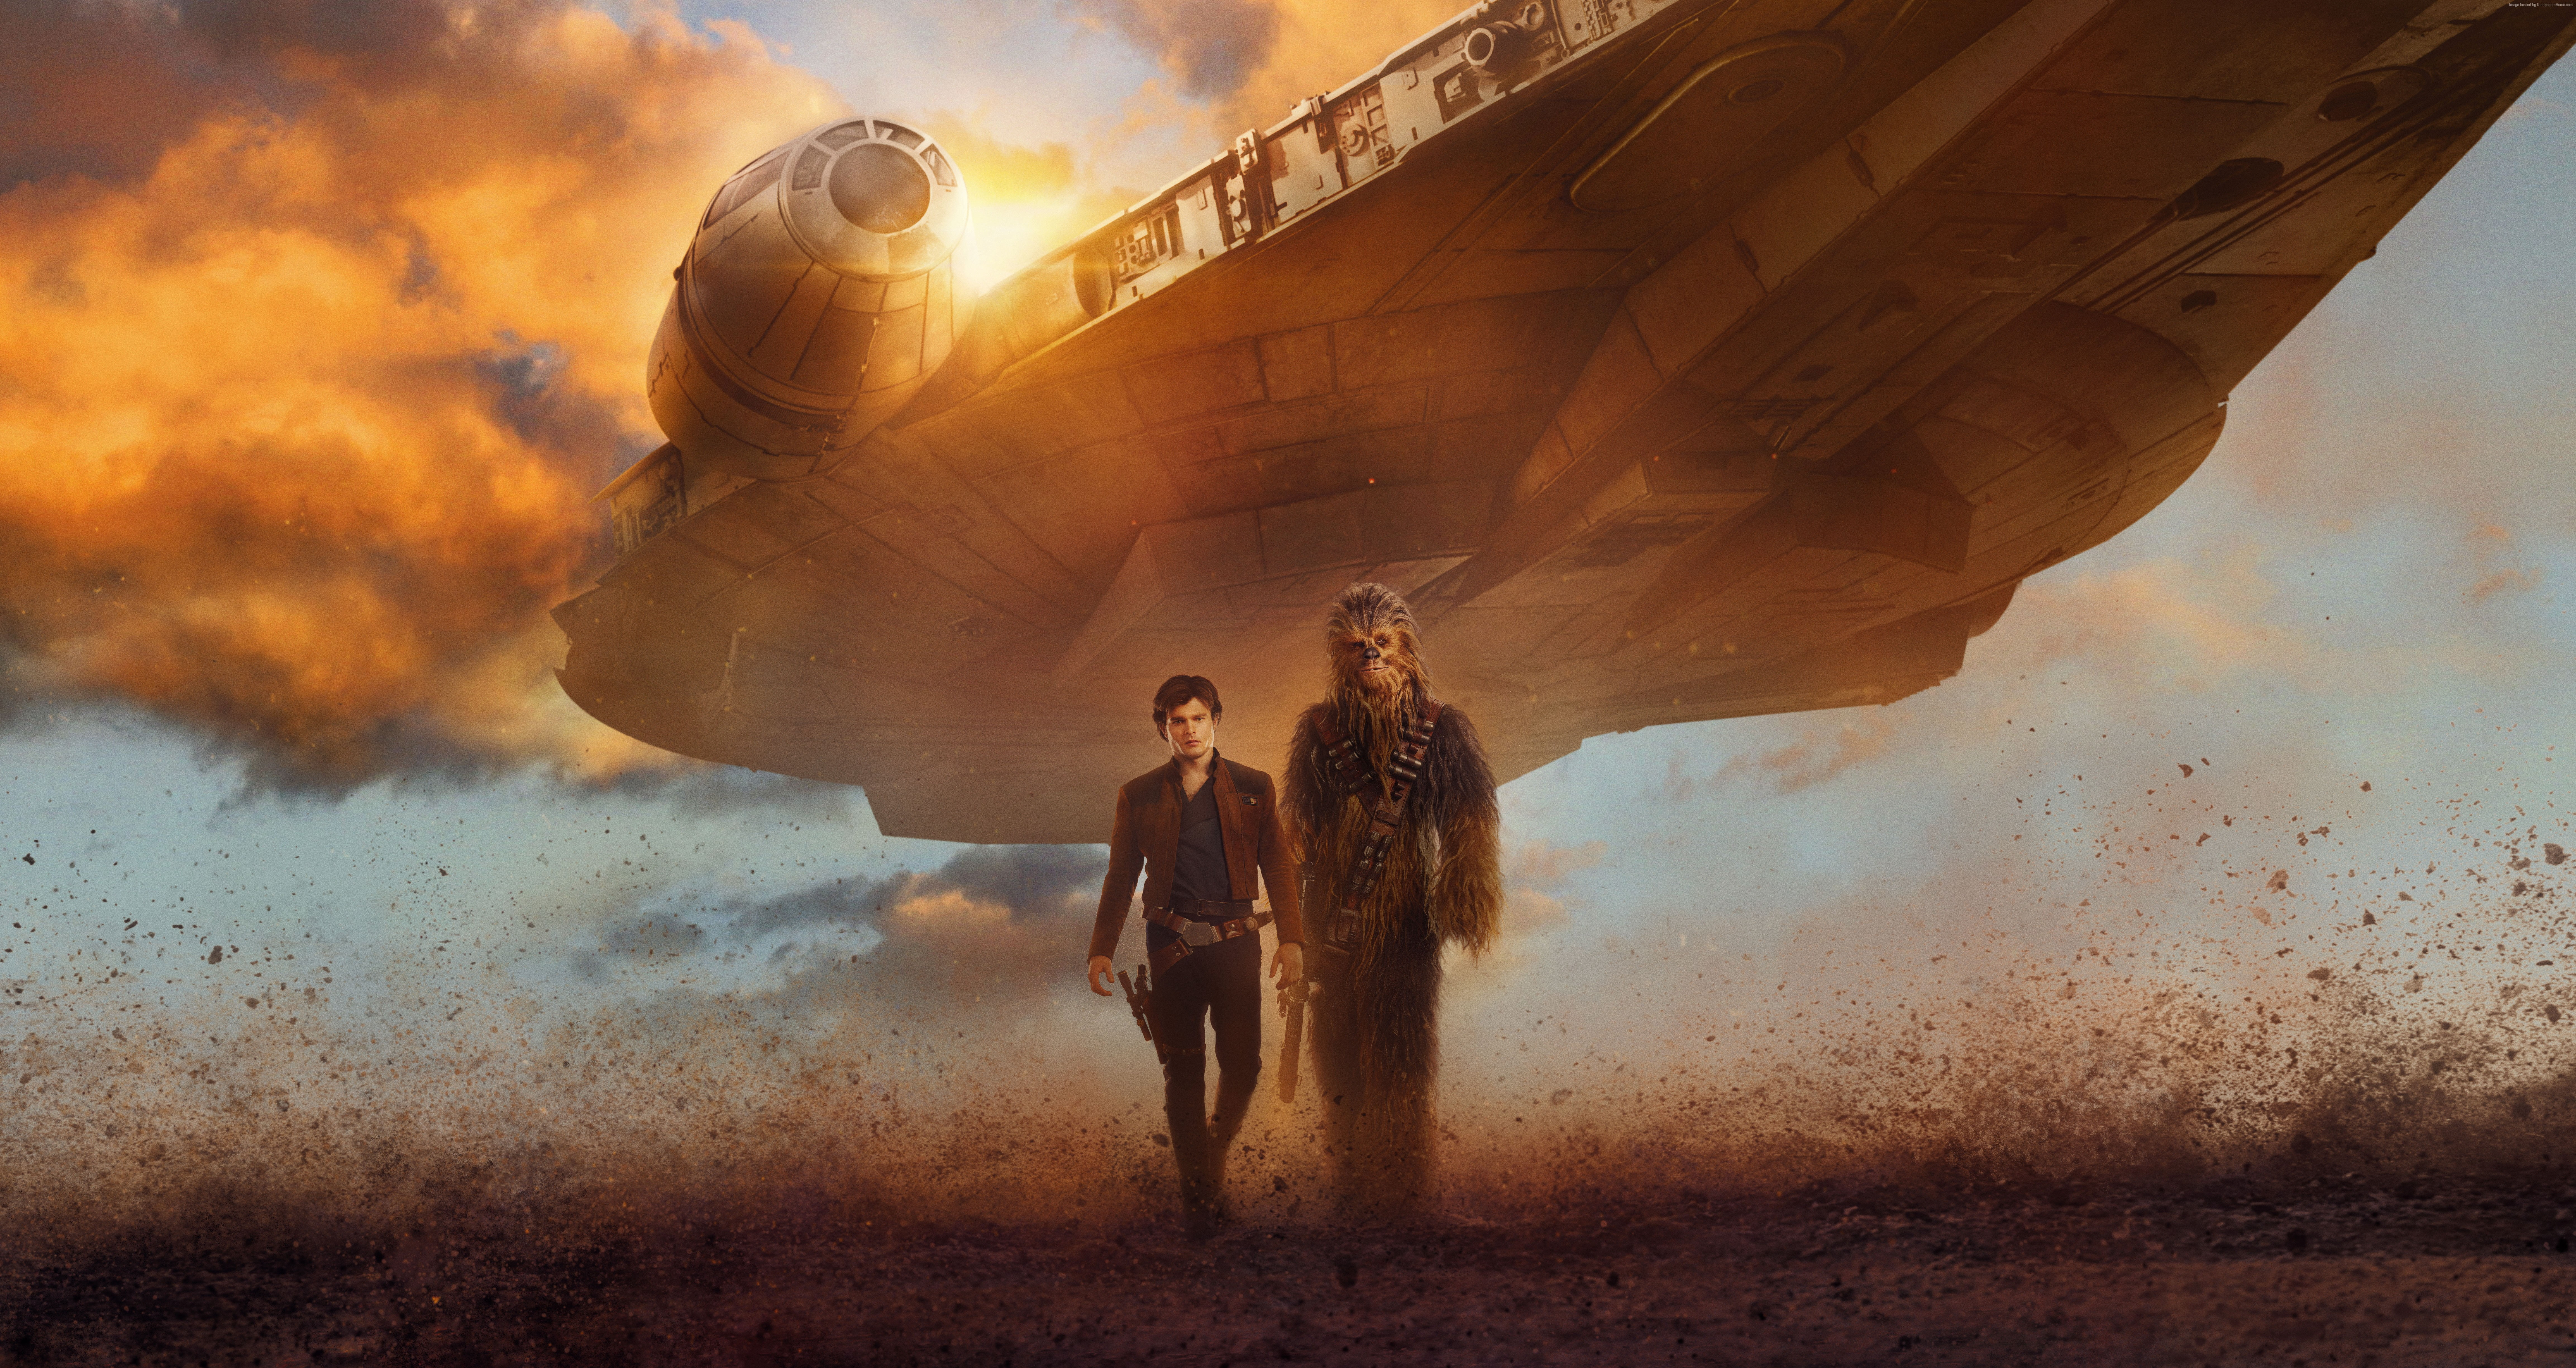 Solo A Star Wars Story Wallpapers Hd 9225x4899 Wallpaper Teahub Io